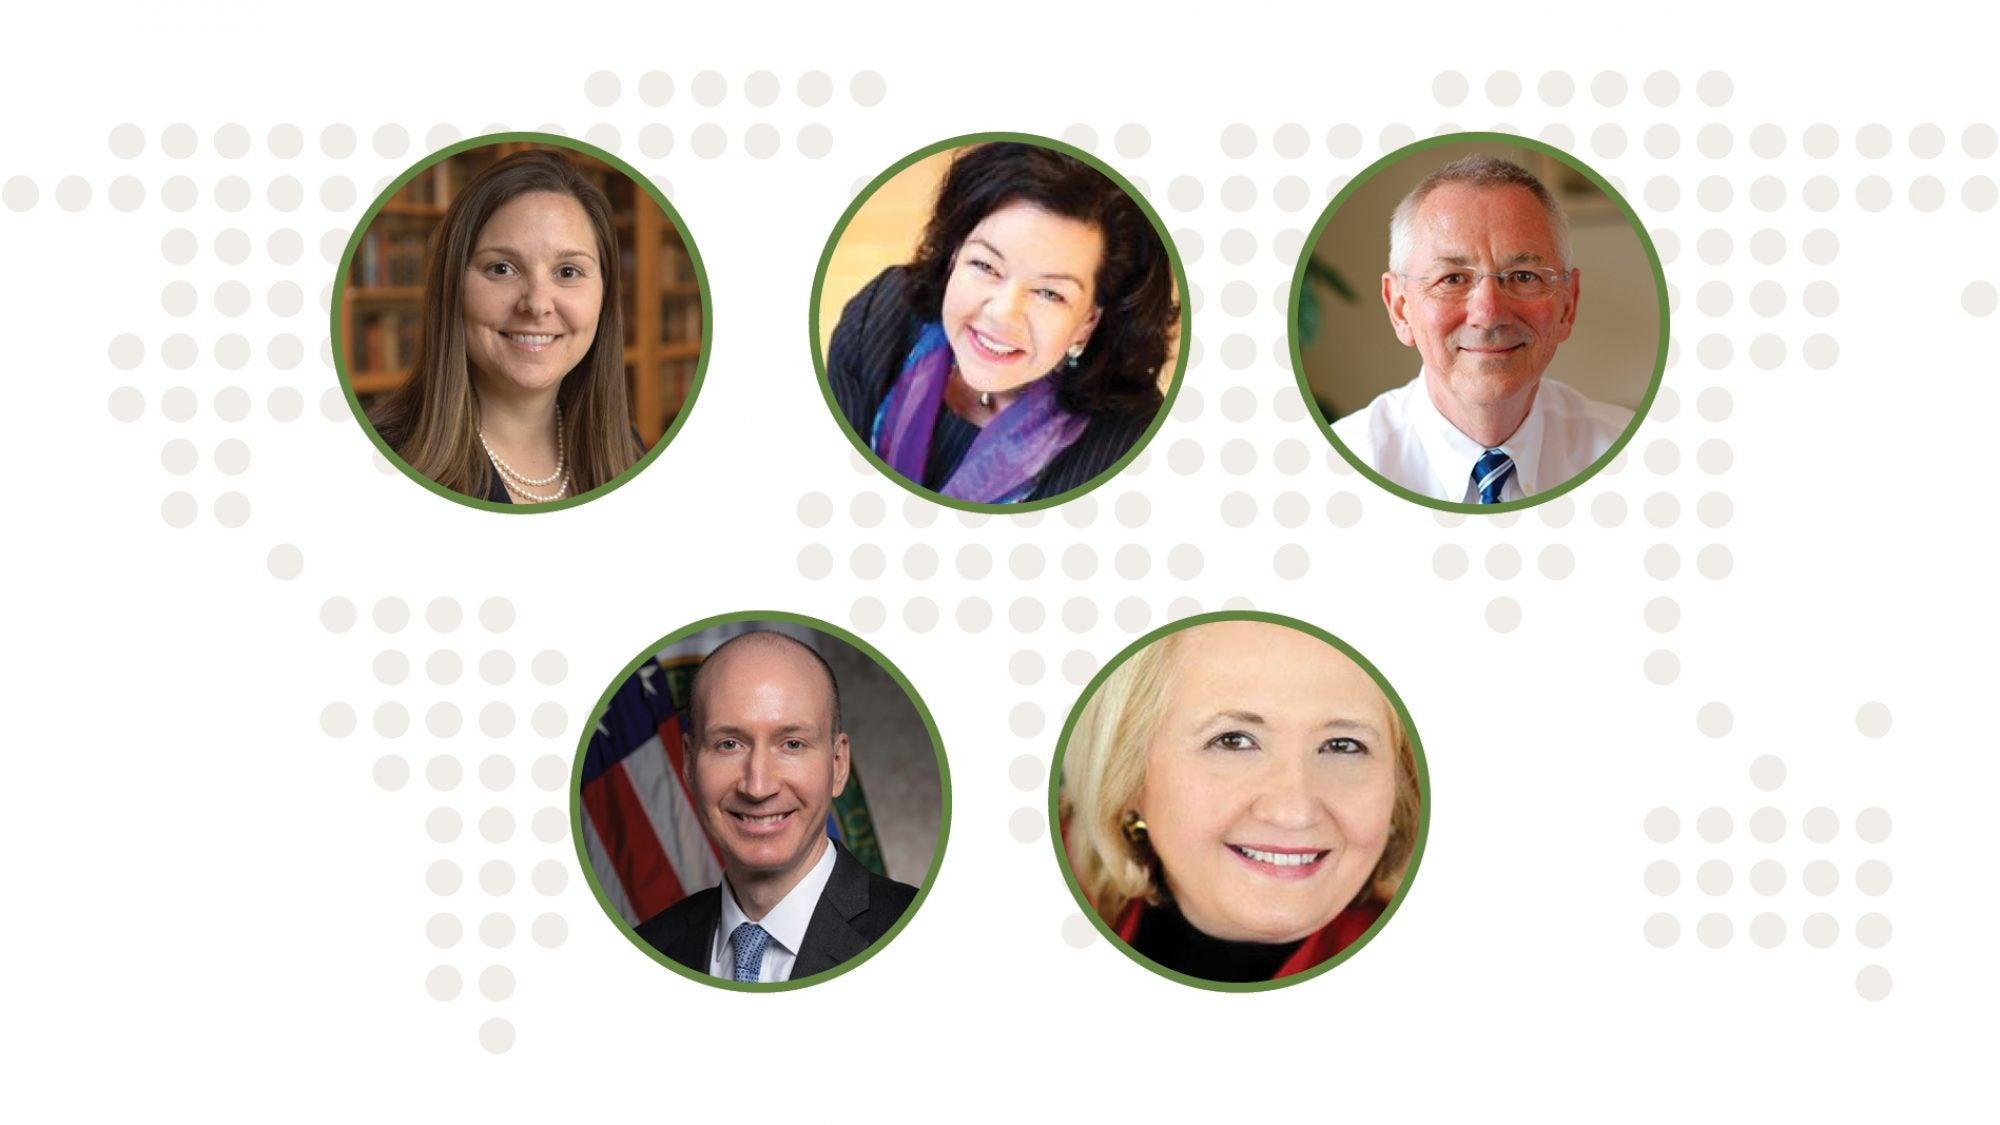 Headshots of Joanna Lewis, Karen Pierce, Andrew Steer, Dave Turk, and Melanne Verveer